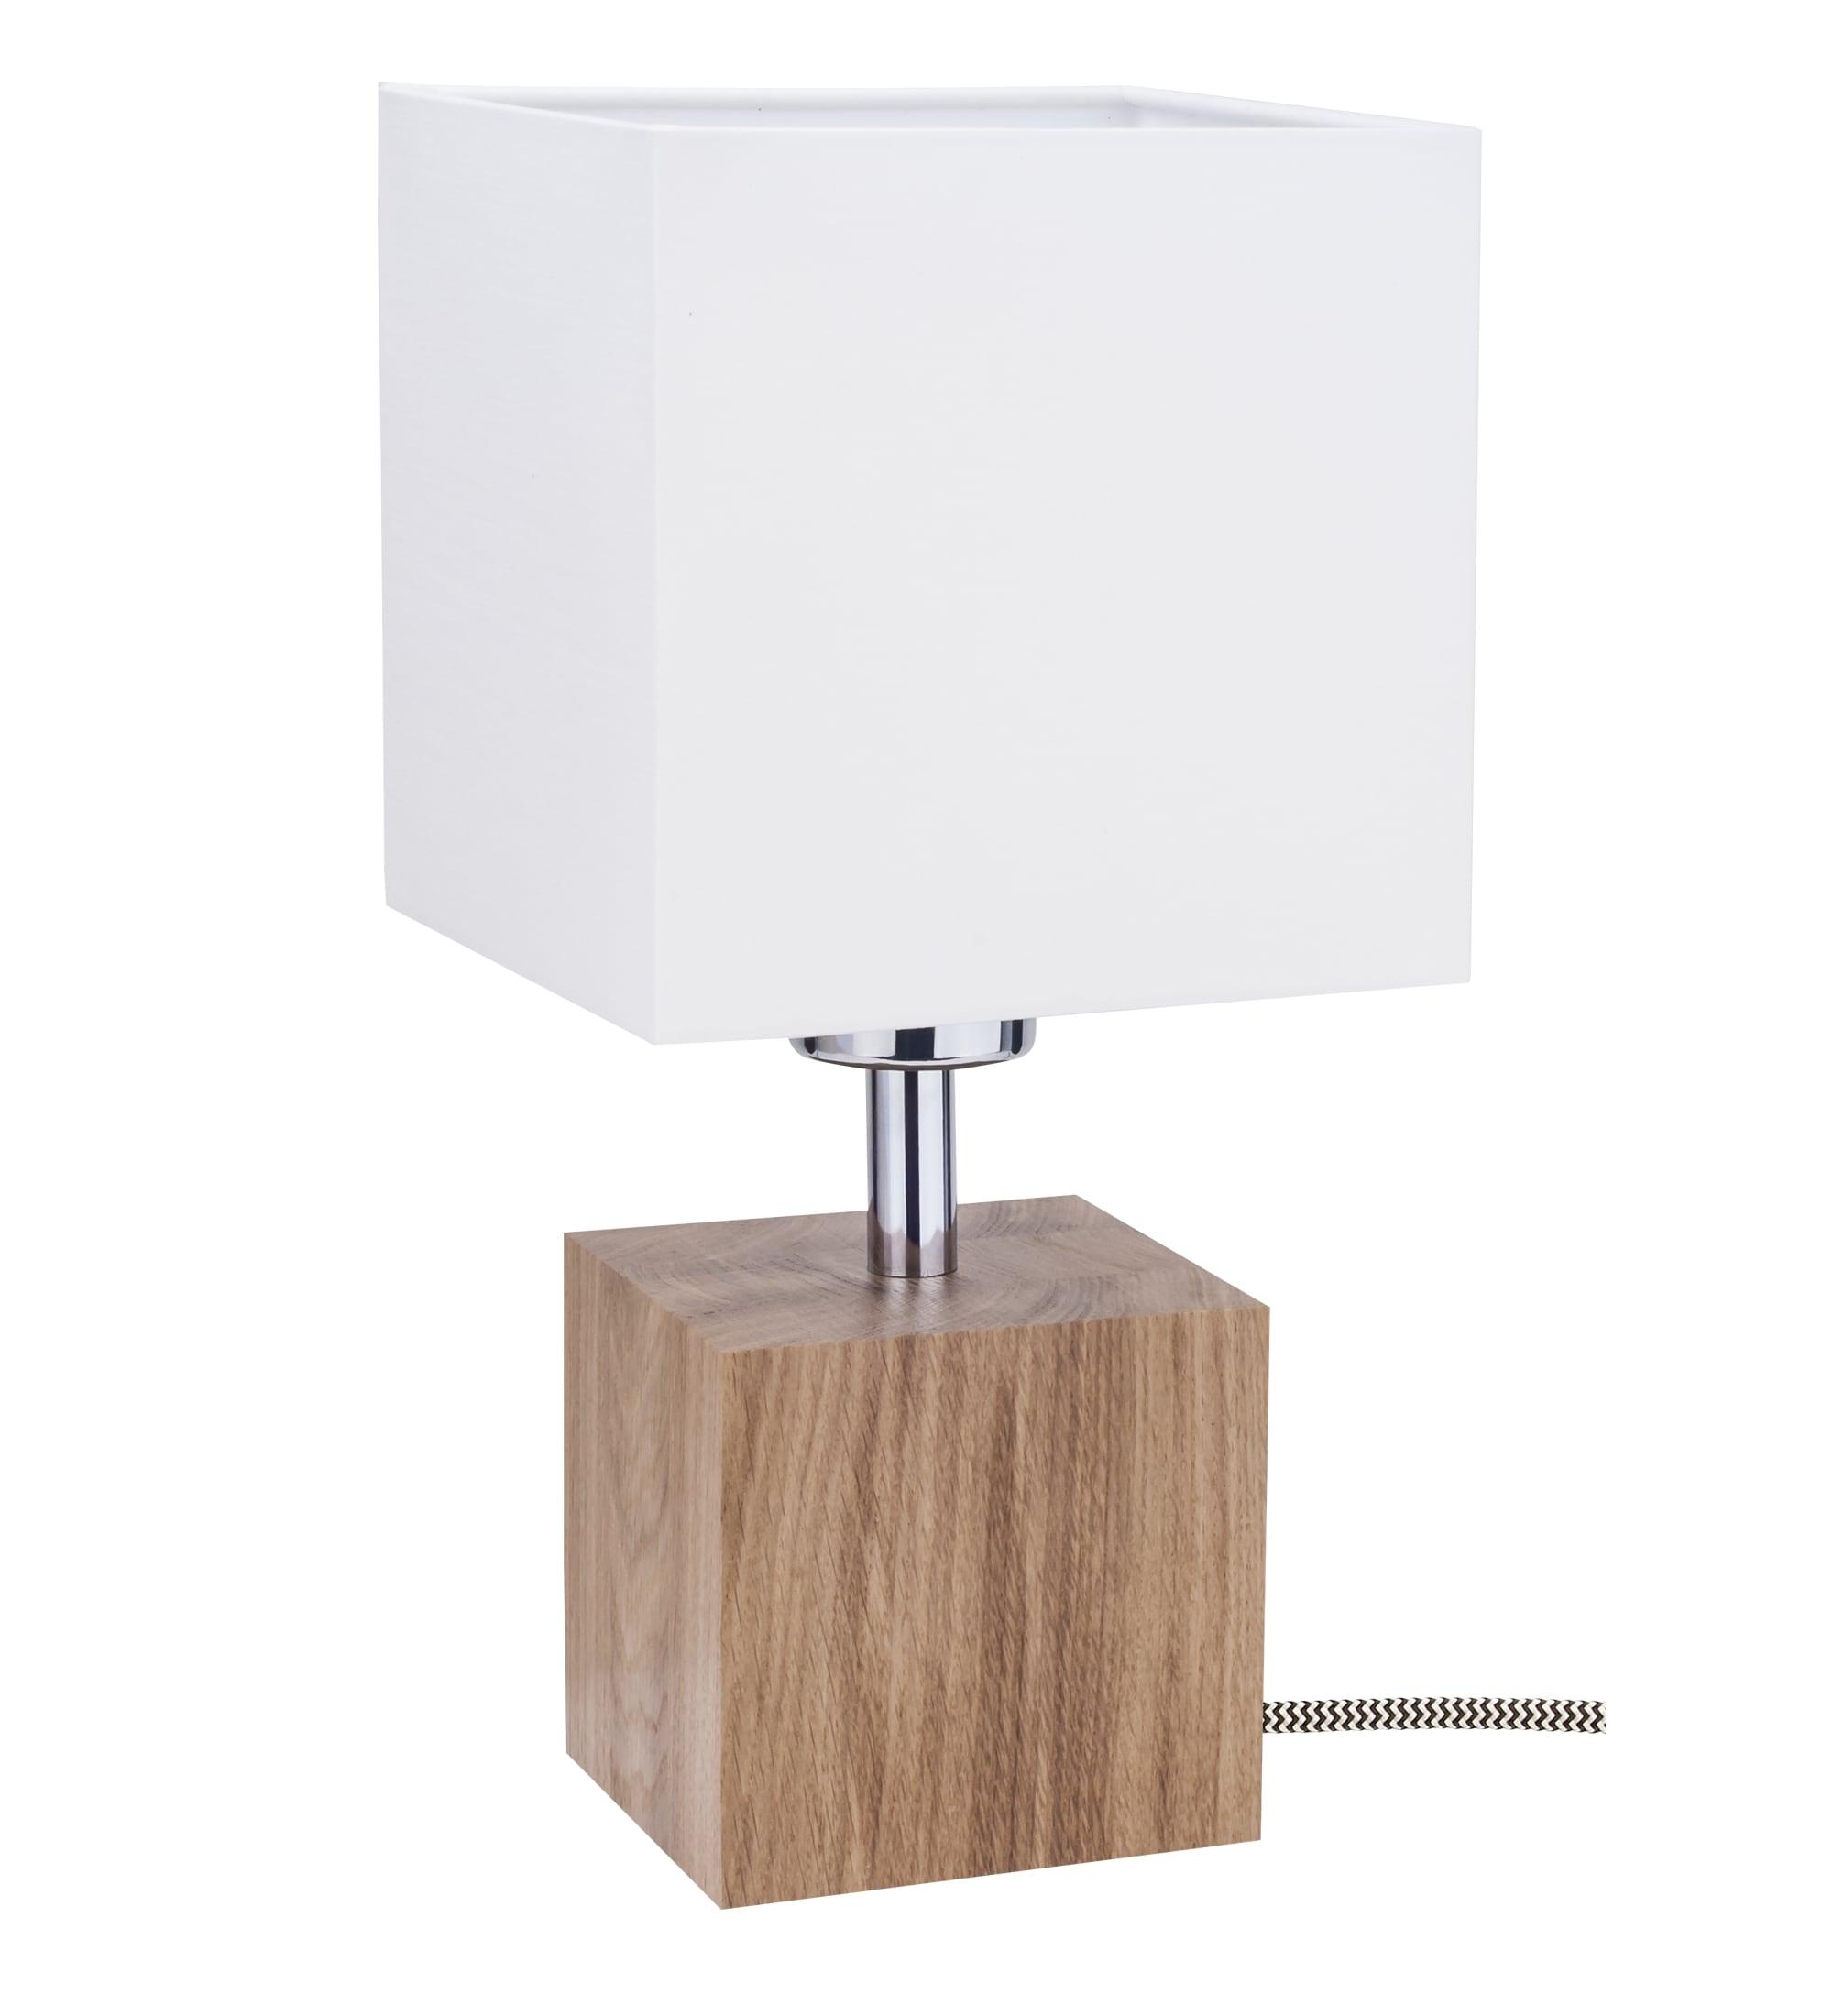 Table lamp Trongo dąb / czarno-biały / white E27 60W